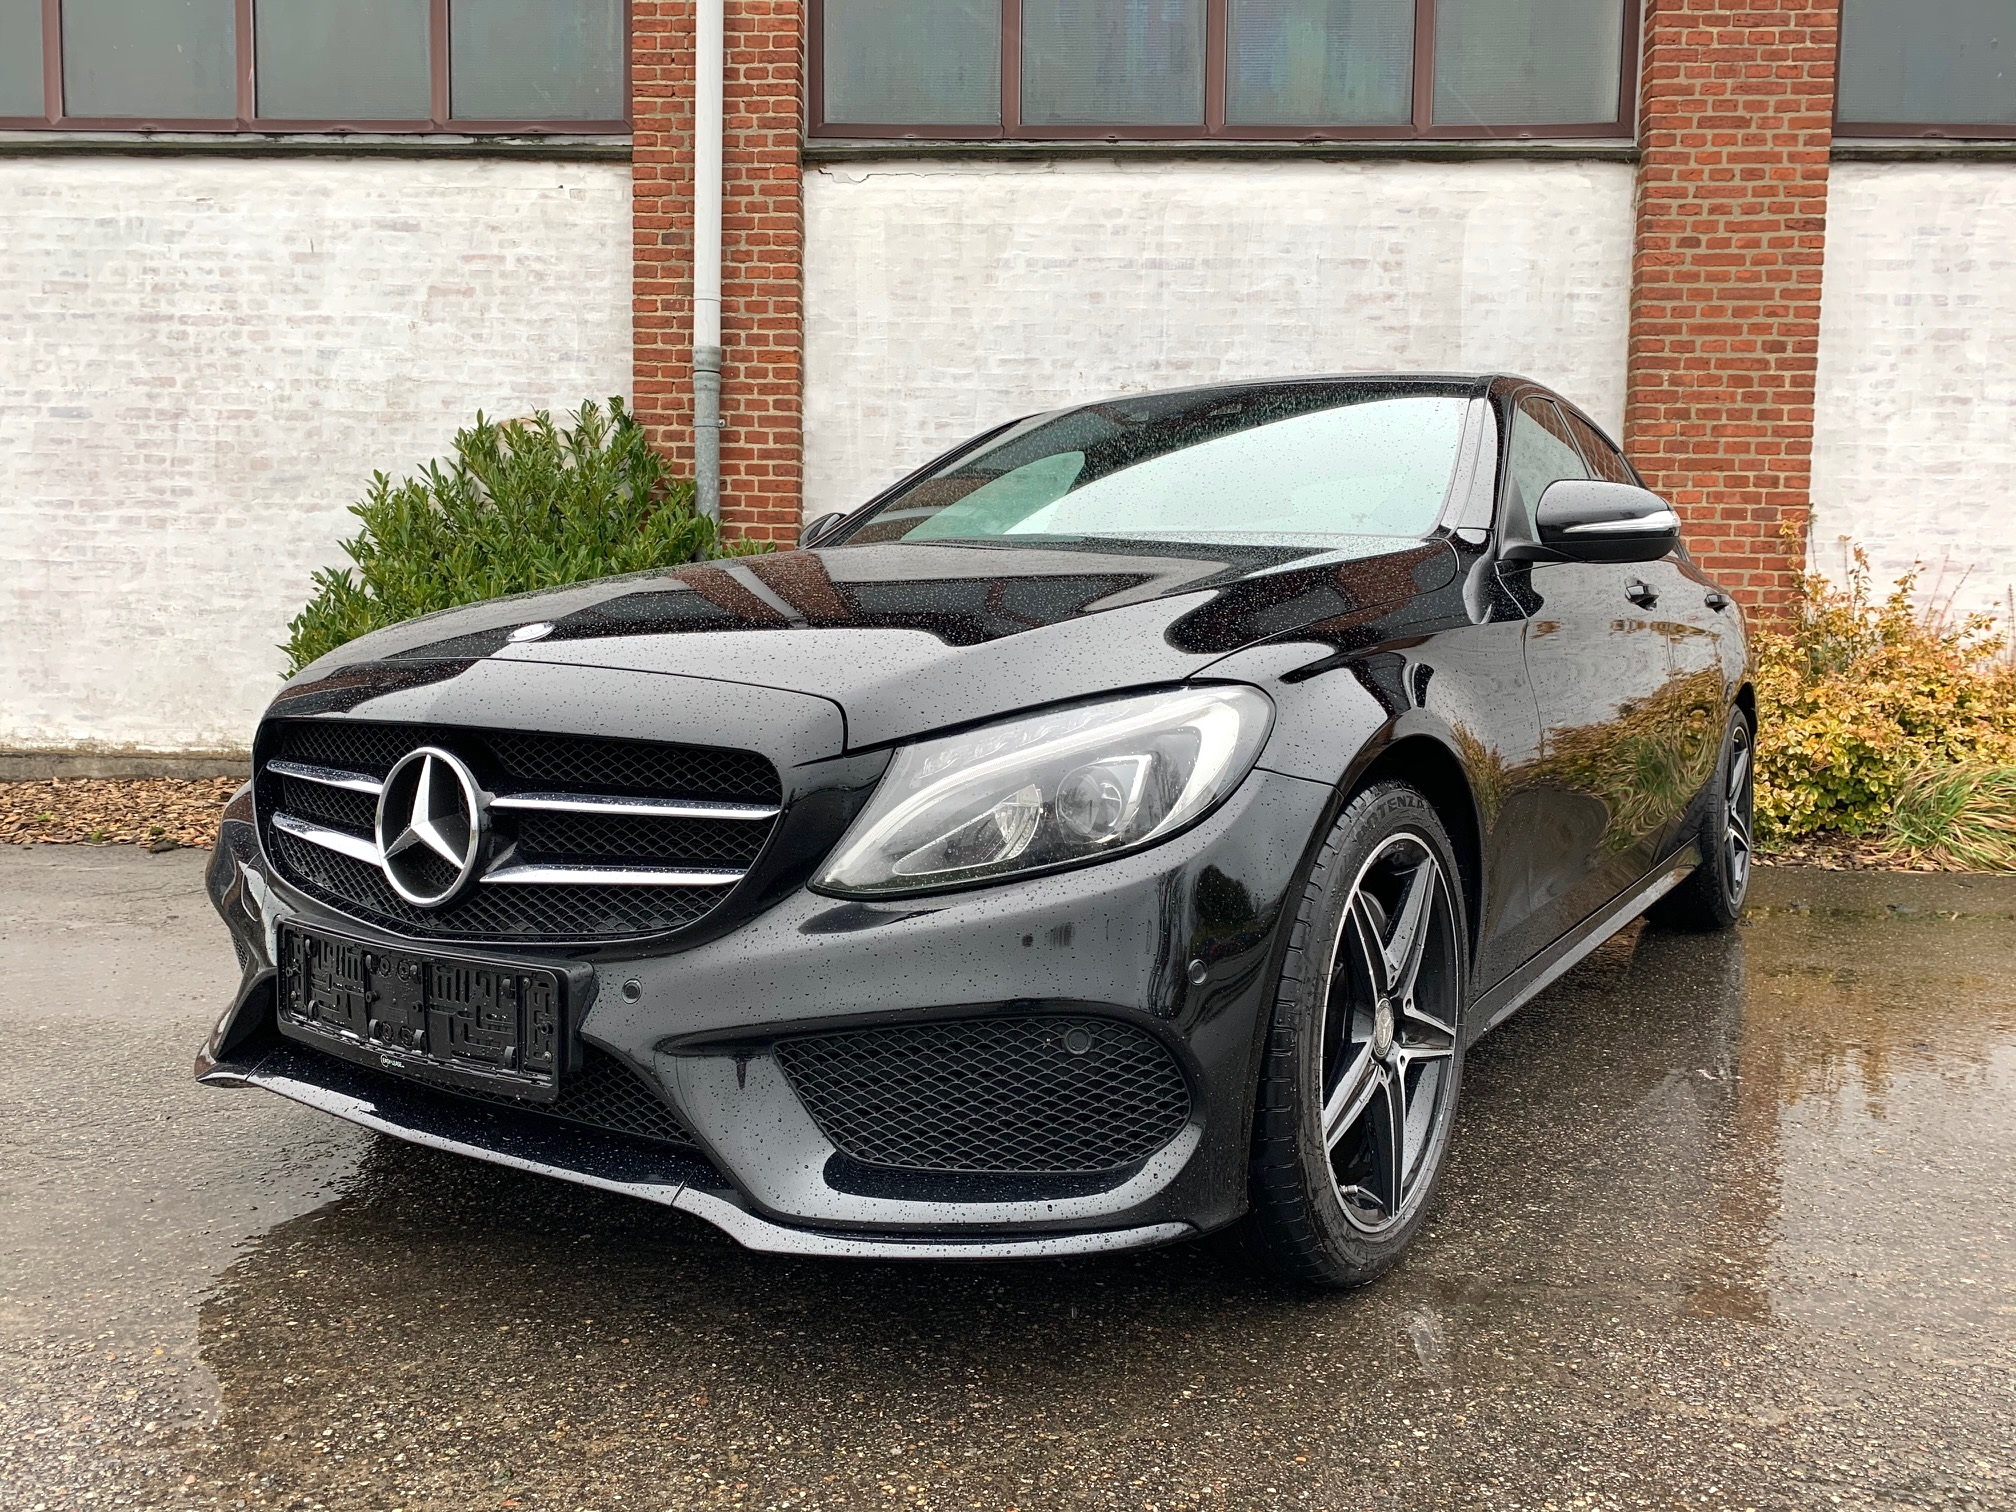 Mercedes C200d BT AMG